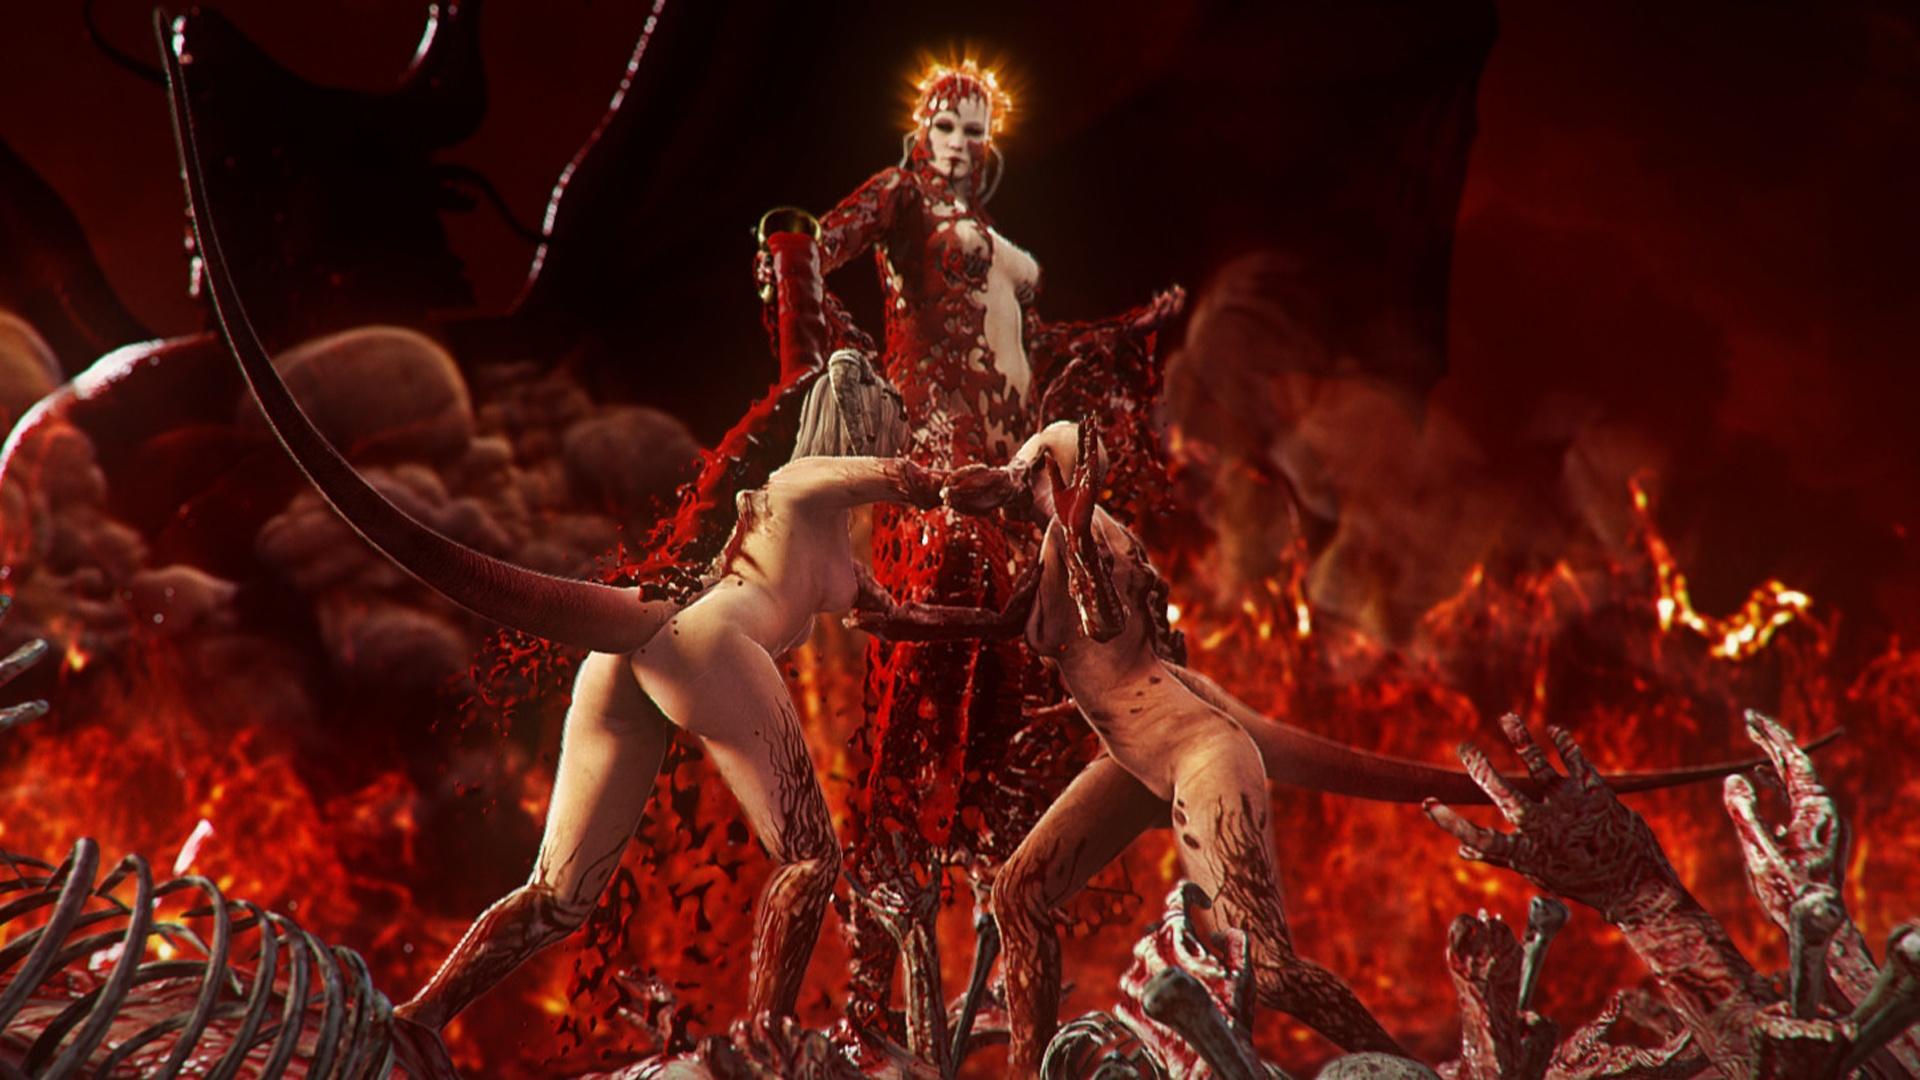 Agonie Dämon begrüßt Sie die Hölle